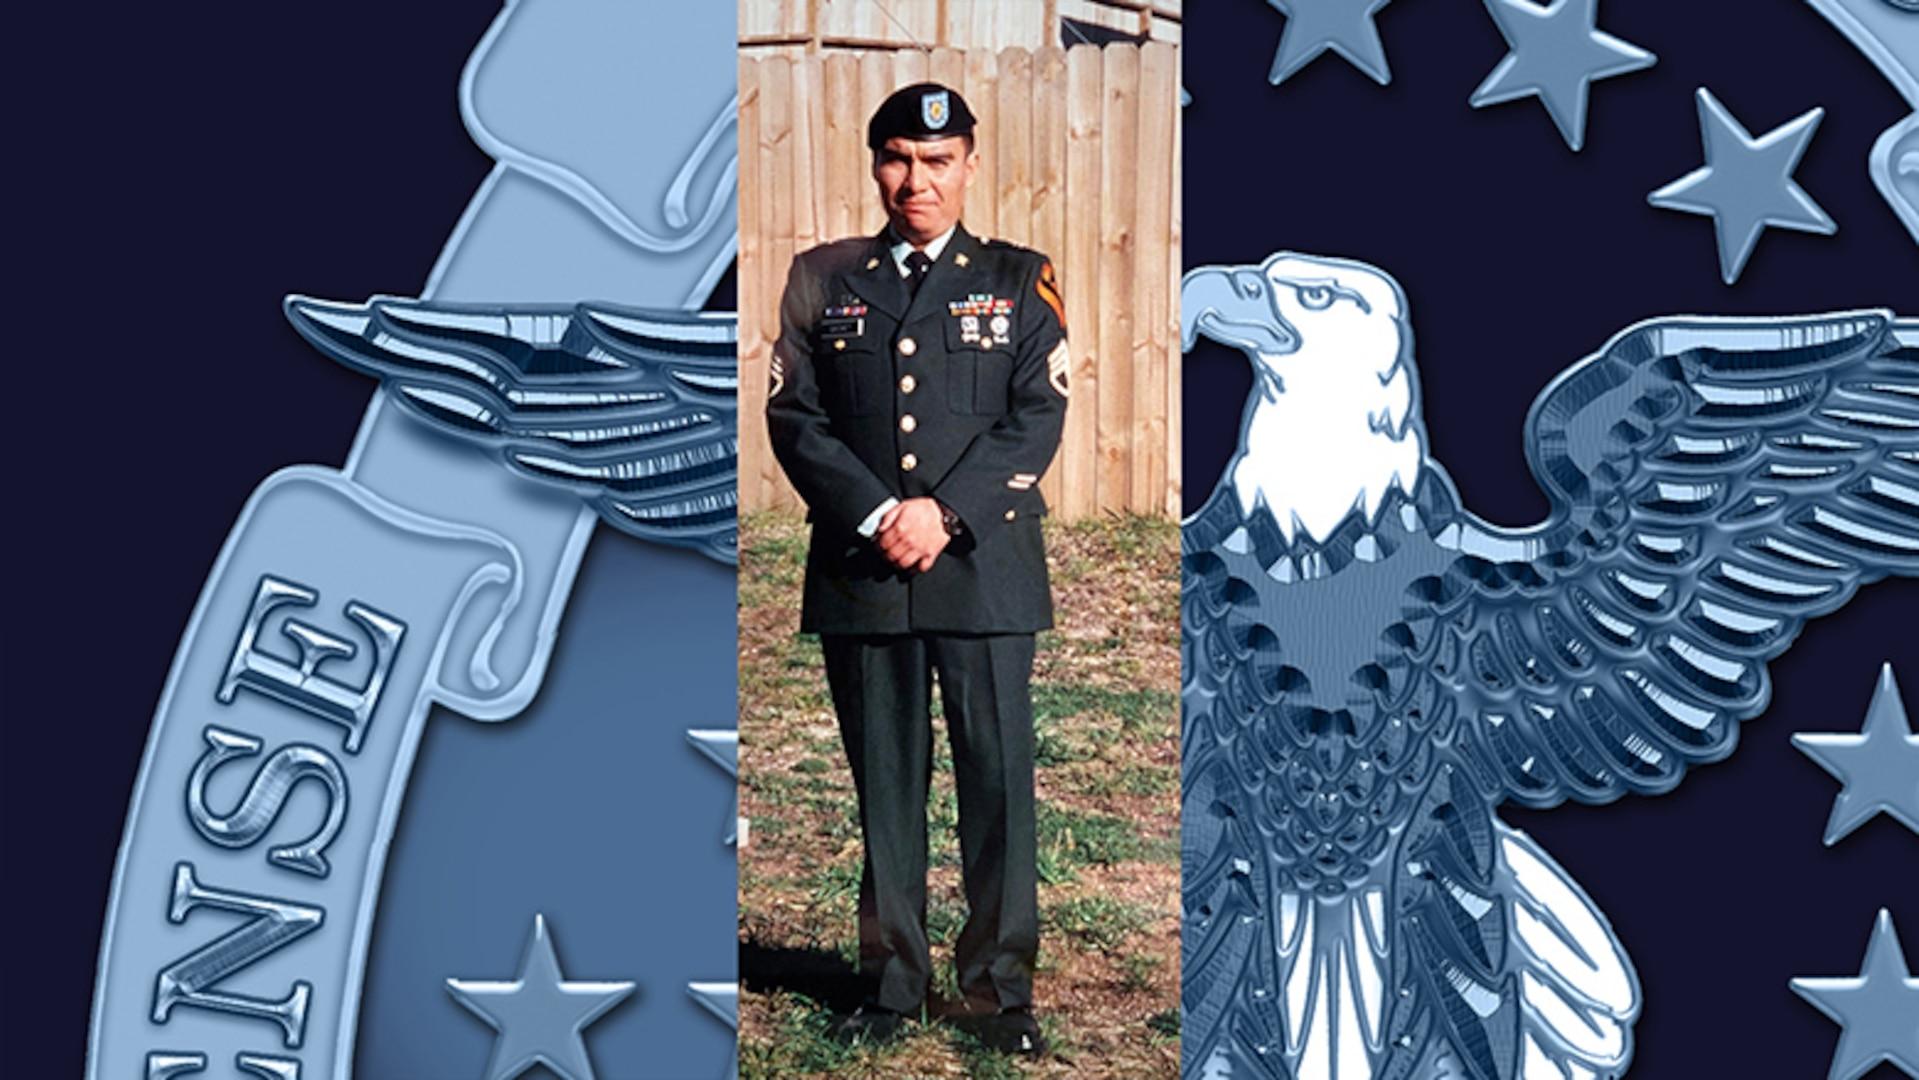 DLA Aviation employees remember 9/11: Juan Carlos Gachet